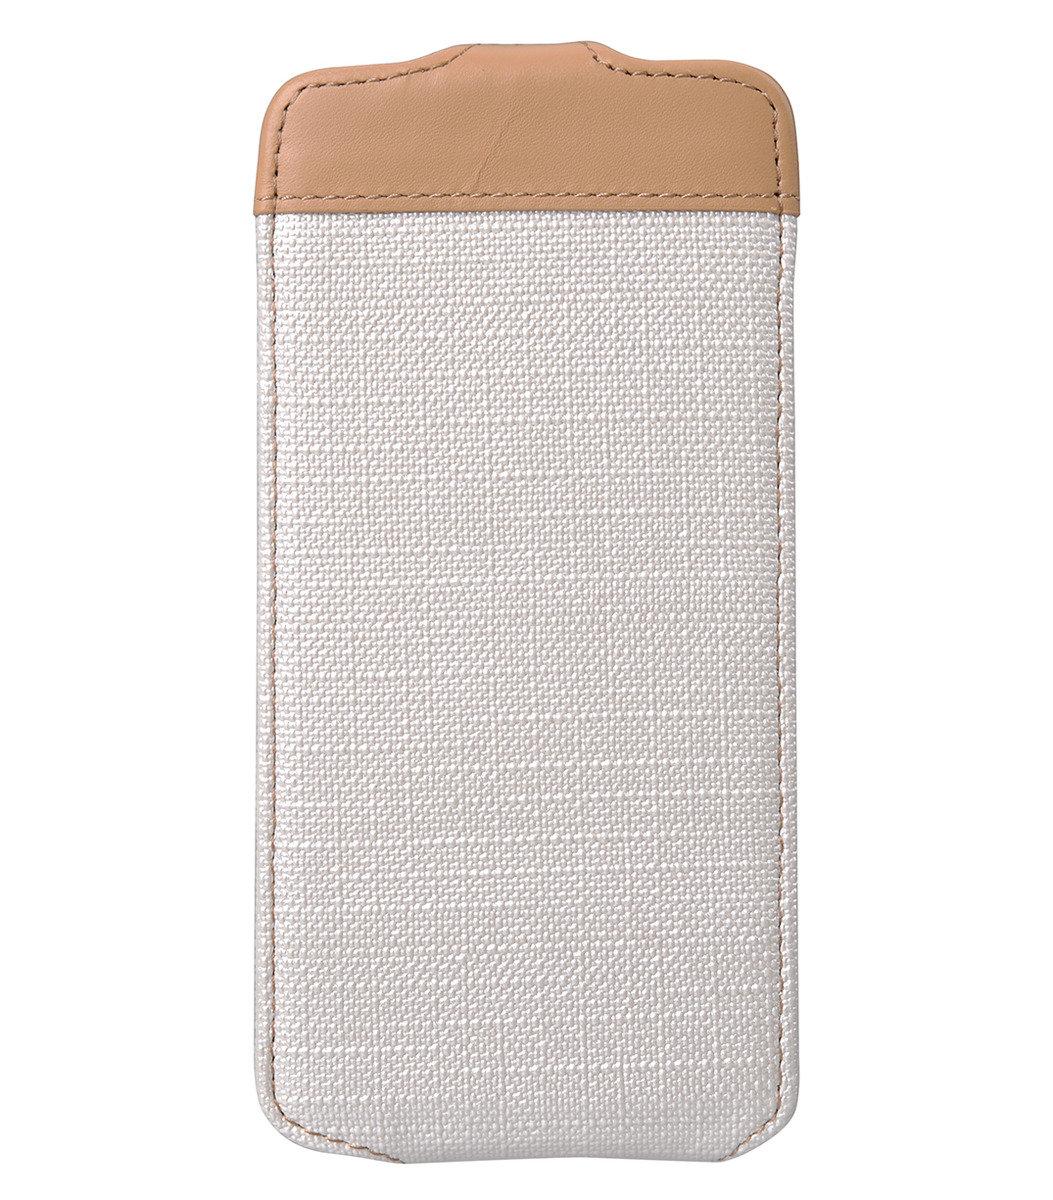 "iPhone 6 Plus/6S Plus (5.5"") Sampu系列 直揭式高級皮革手機套 - 白色"